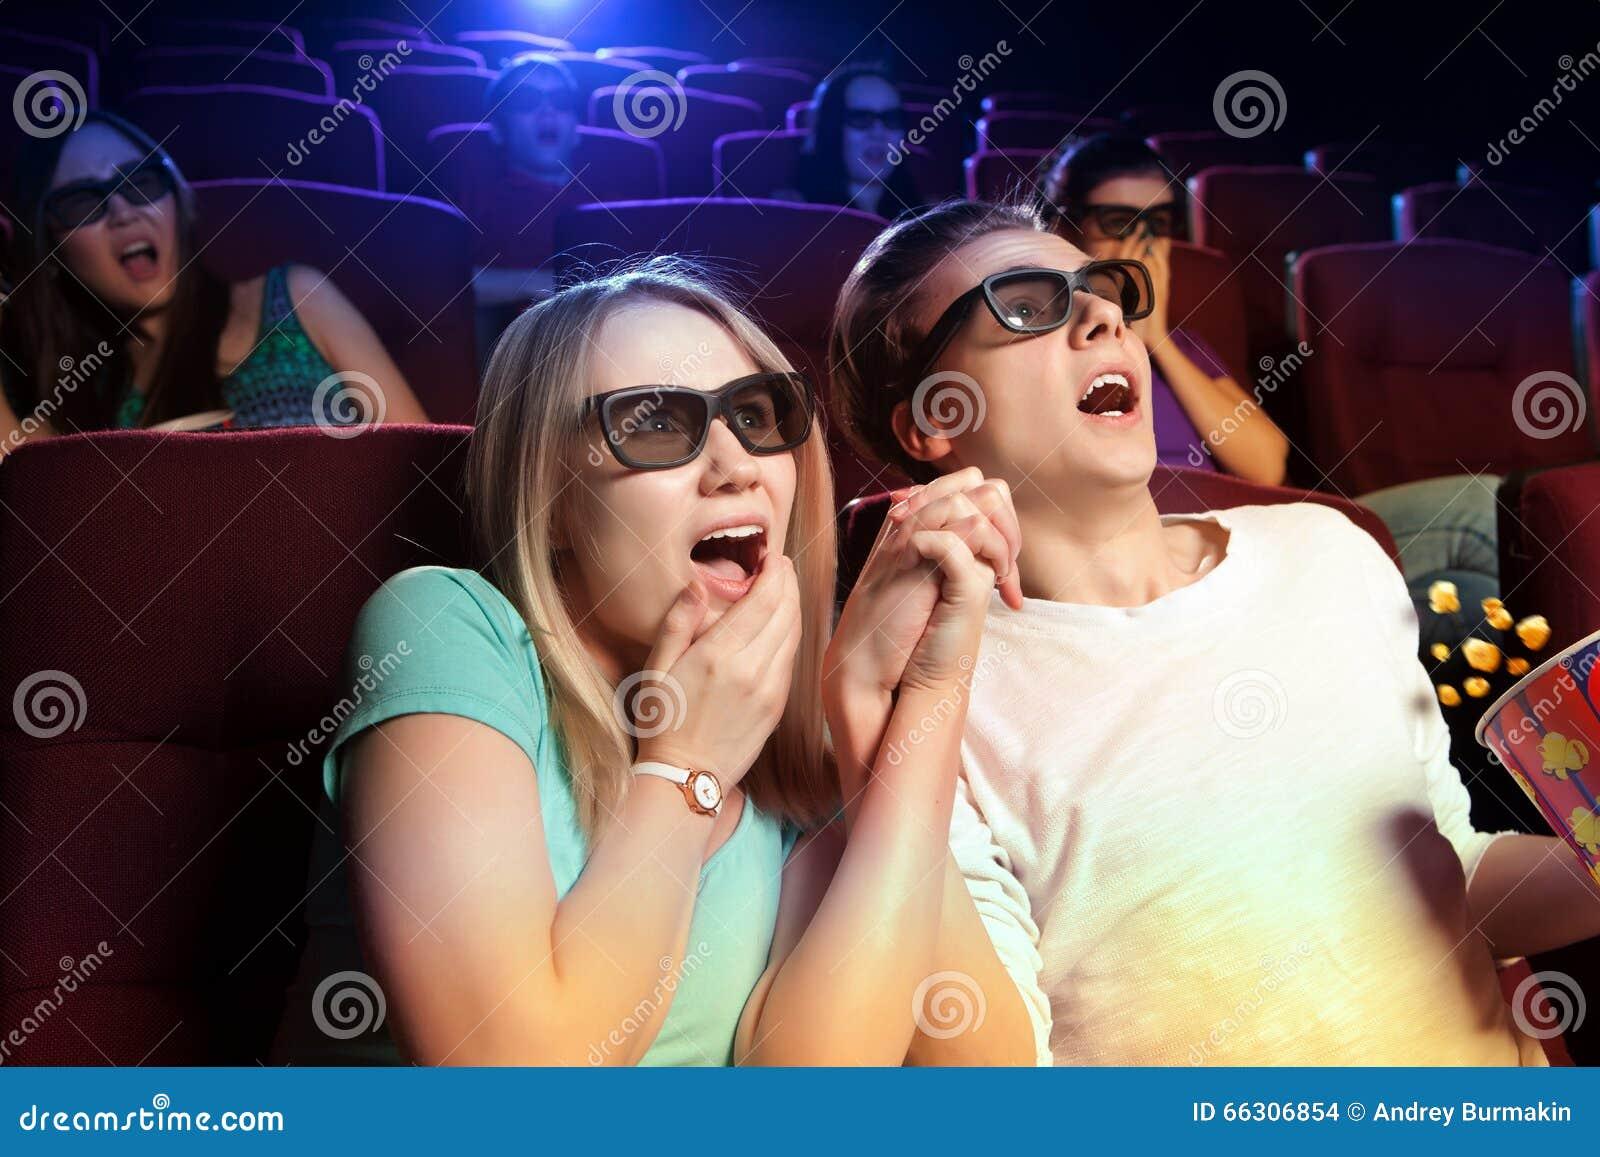 horrorfilme im kino